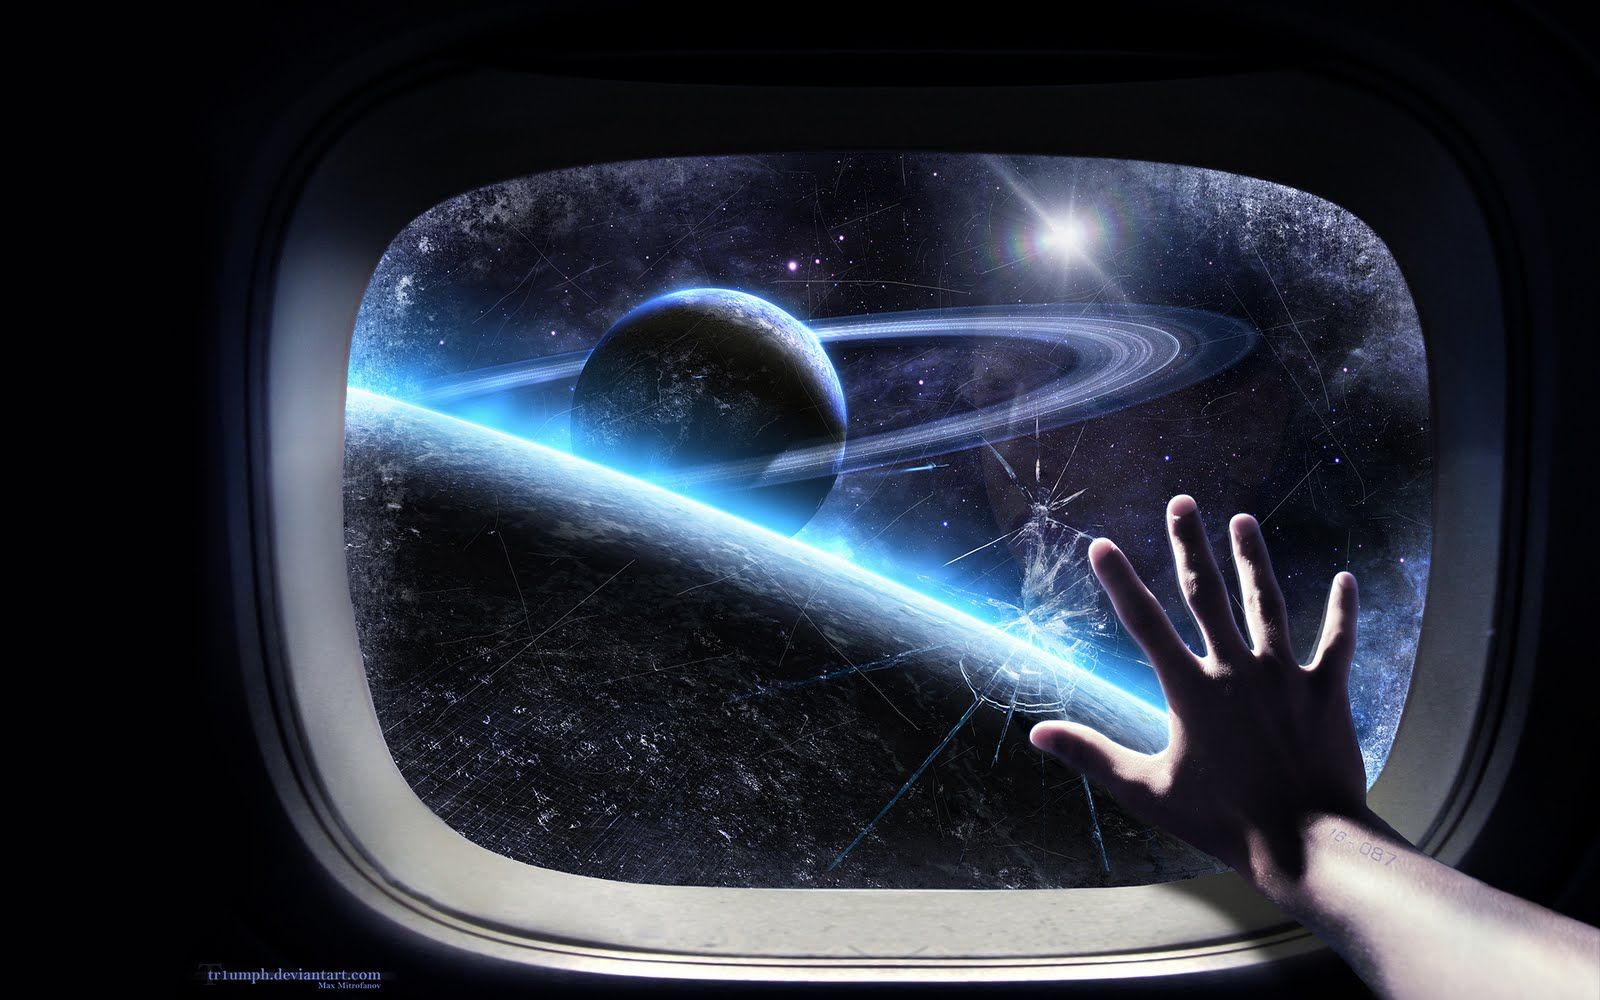 Wallpaper Hd Hublot Espace Science Fiction Free